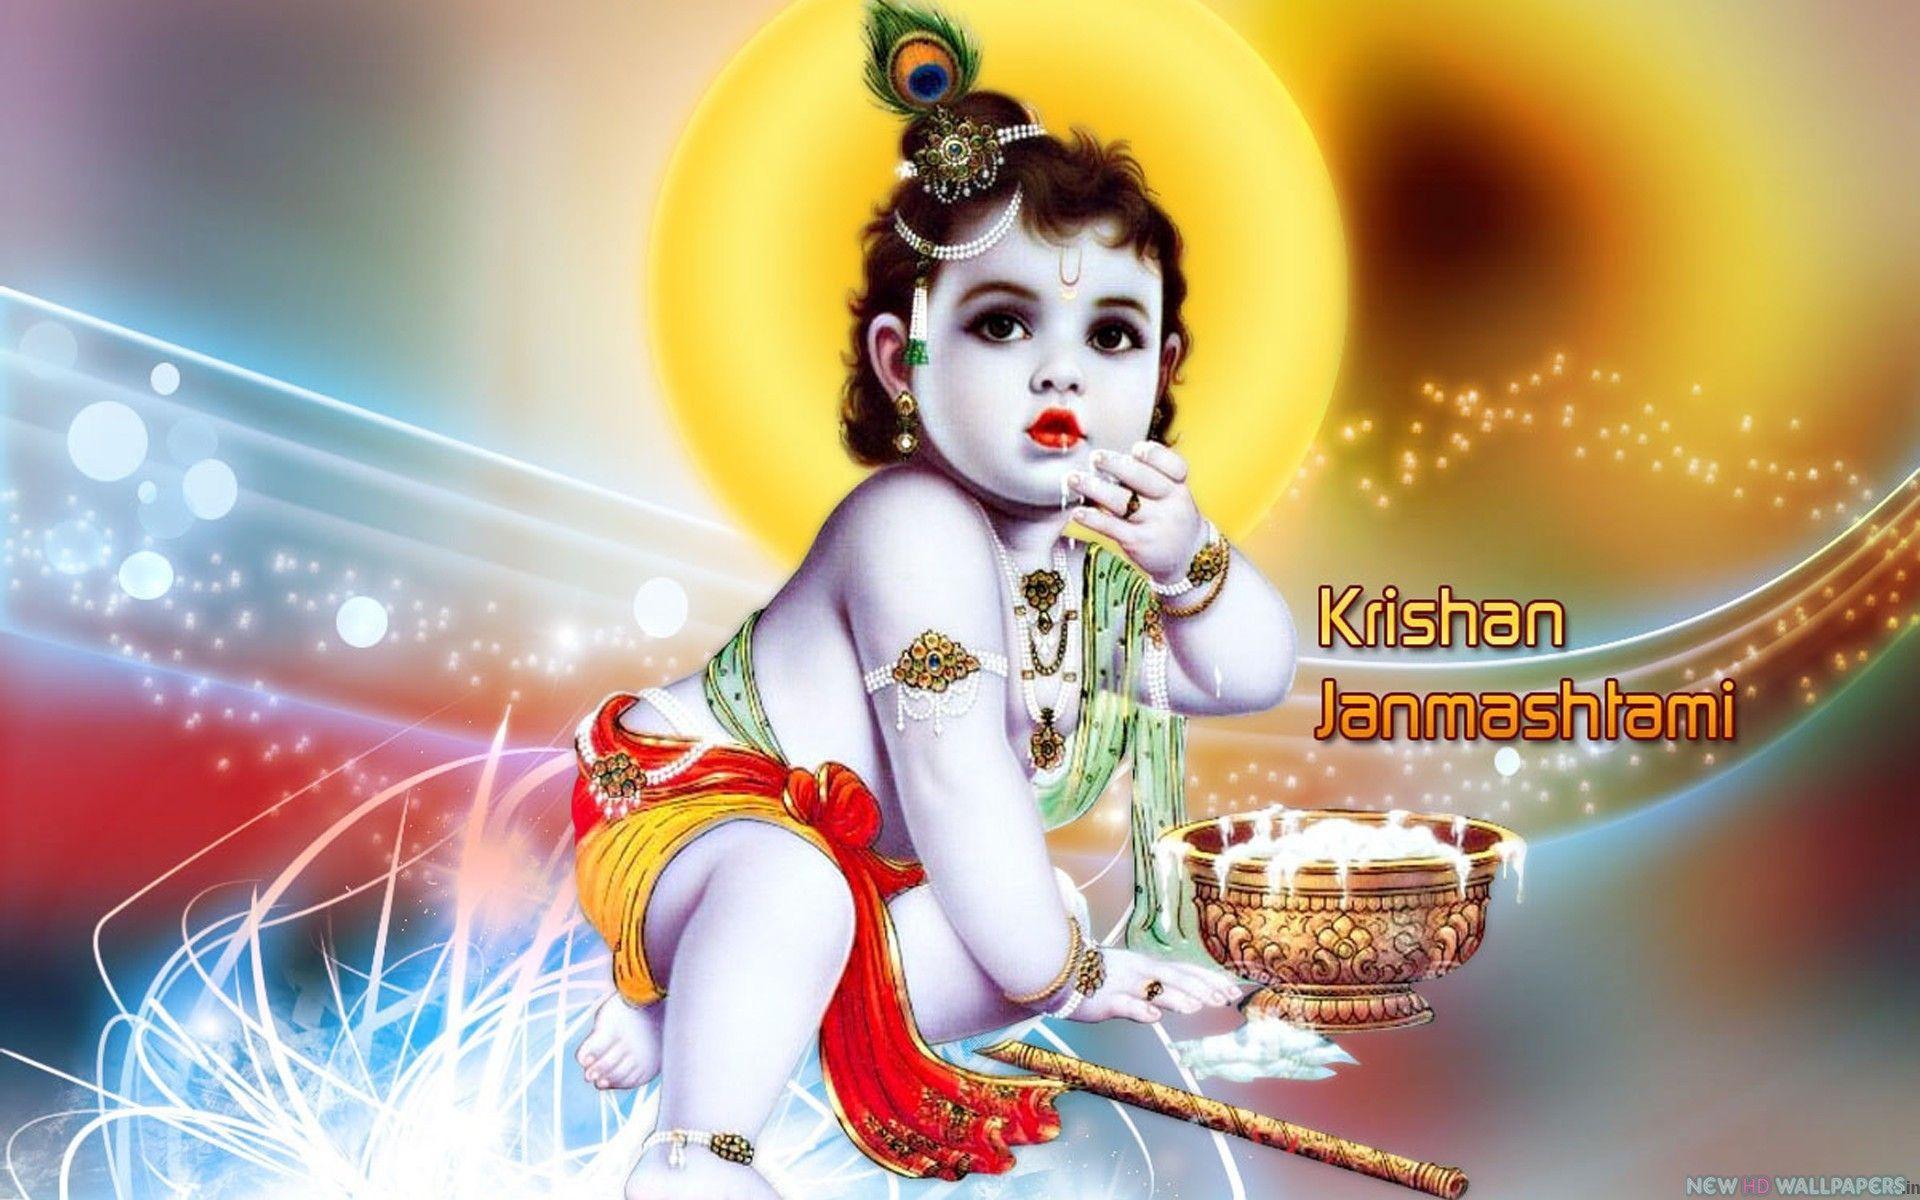 Radha Krishna Star Bharat Serial Hd Wallpapers 1080p Radha Krishna Wallpaper Lord Krishna Hd Wallpaper Krishna Pictures